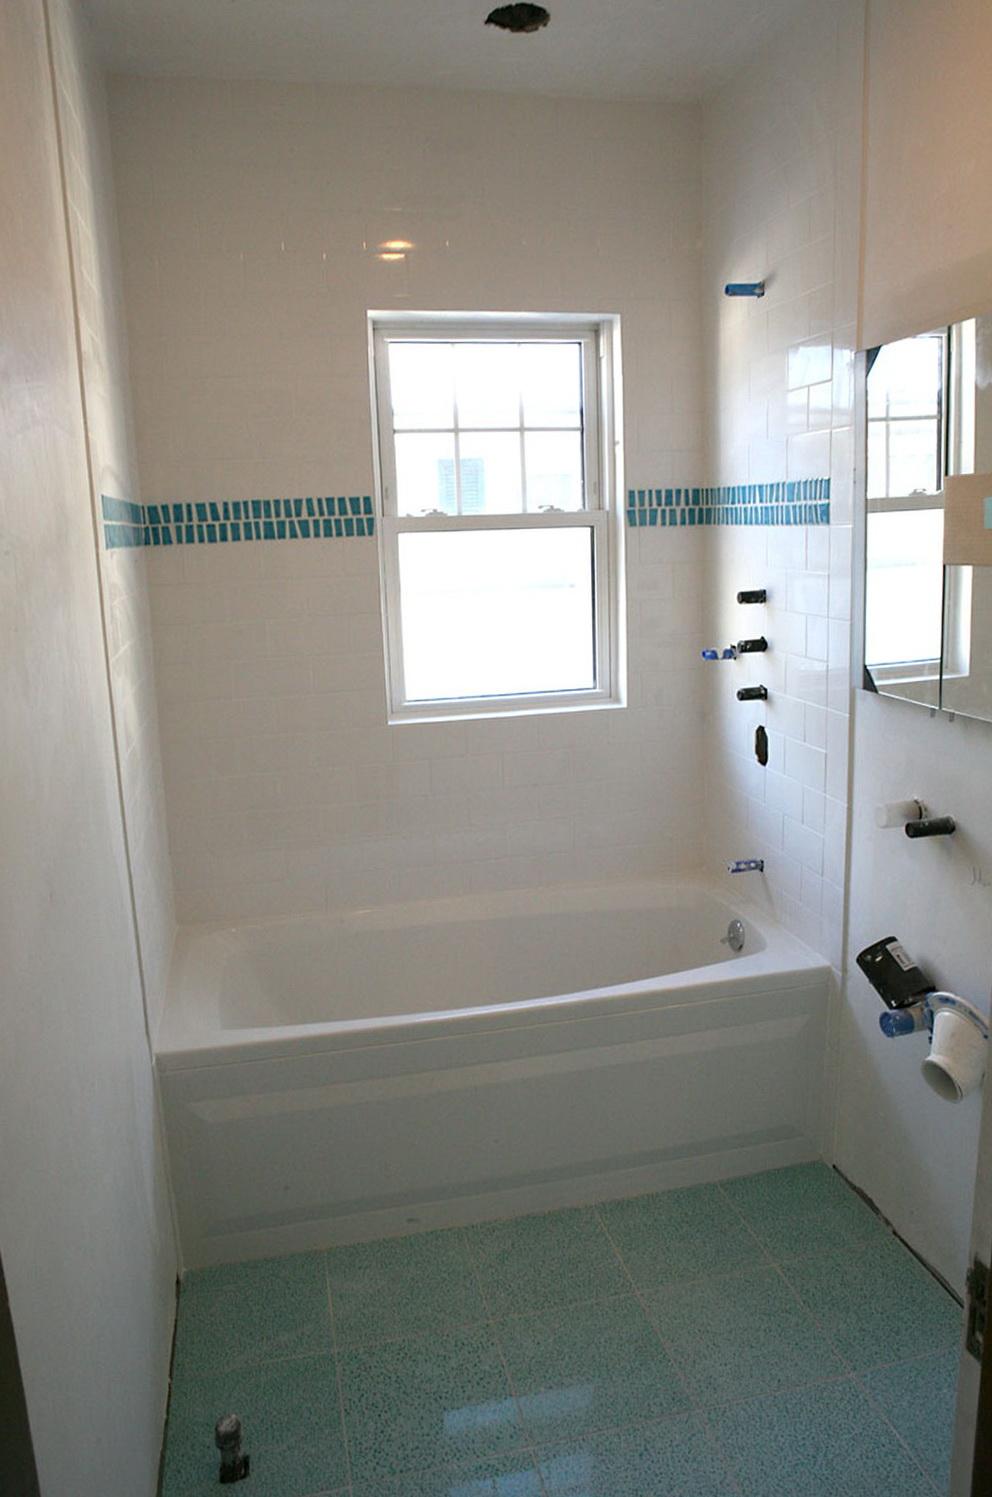 Short Window Curtains For Bathroom